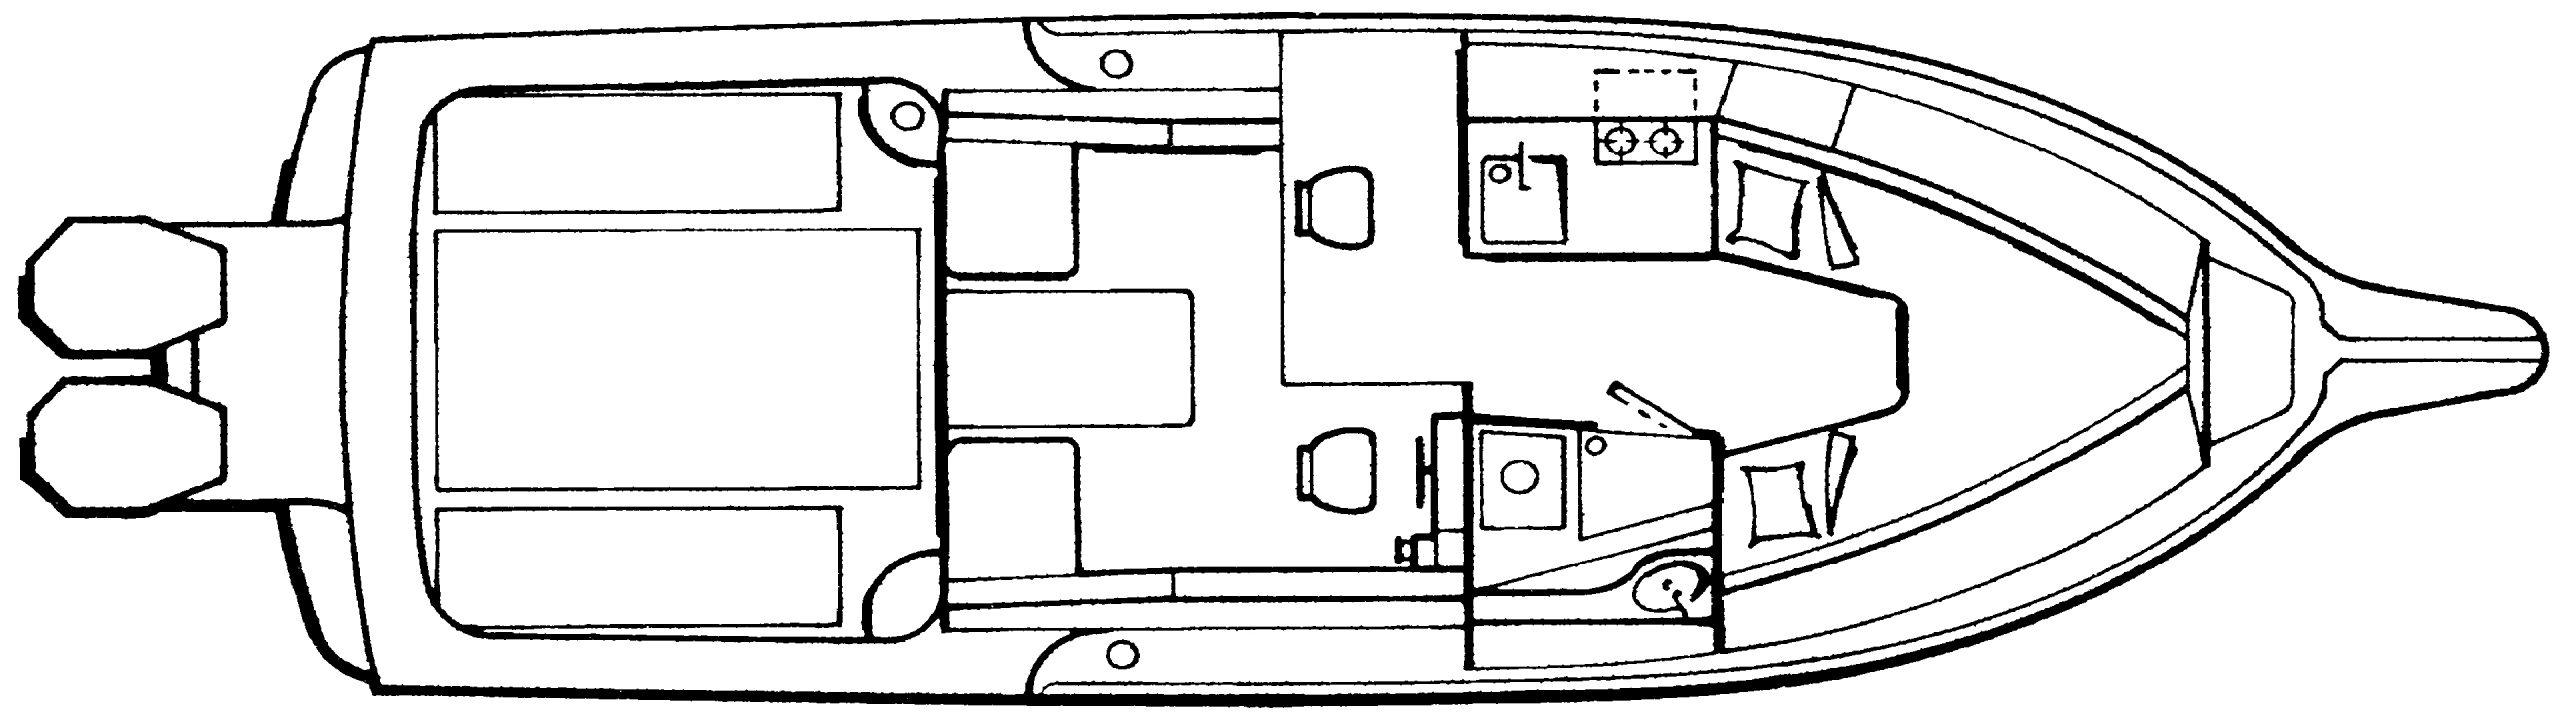 280 Abaco Floor Plan 1